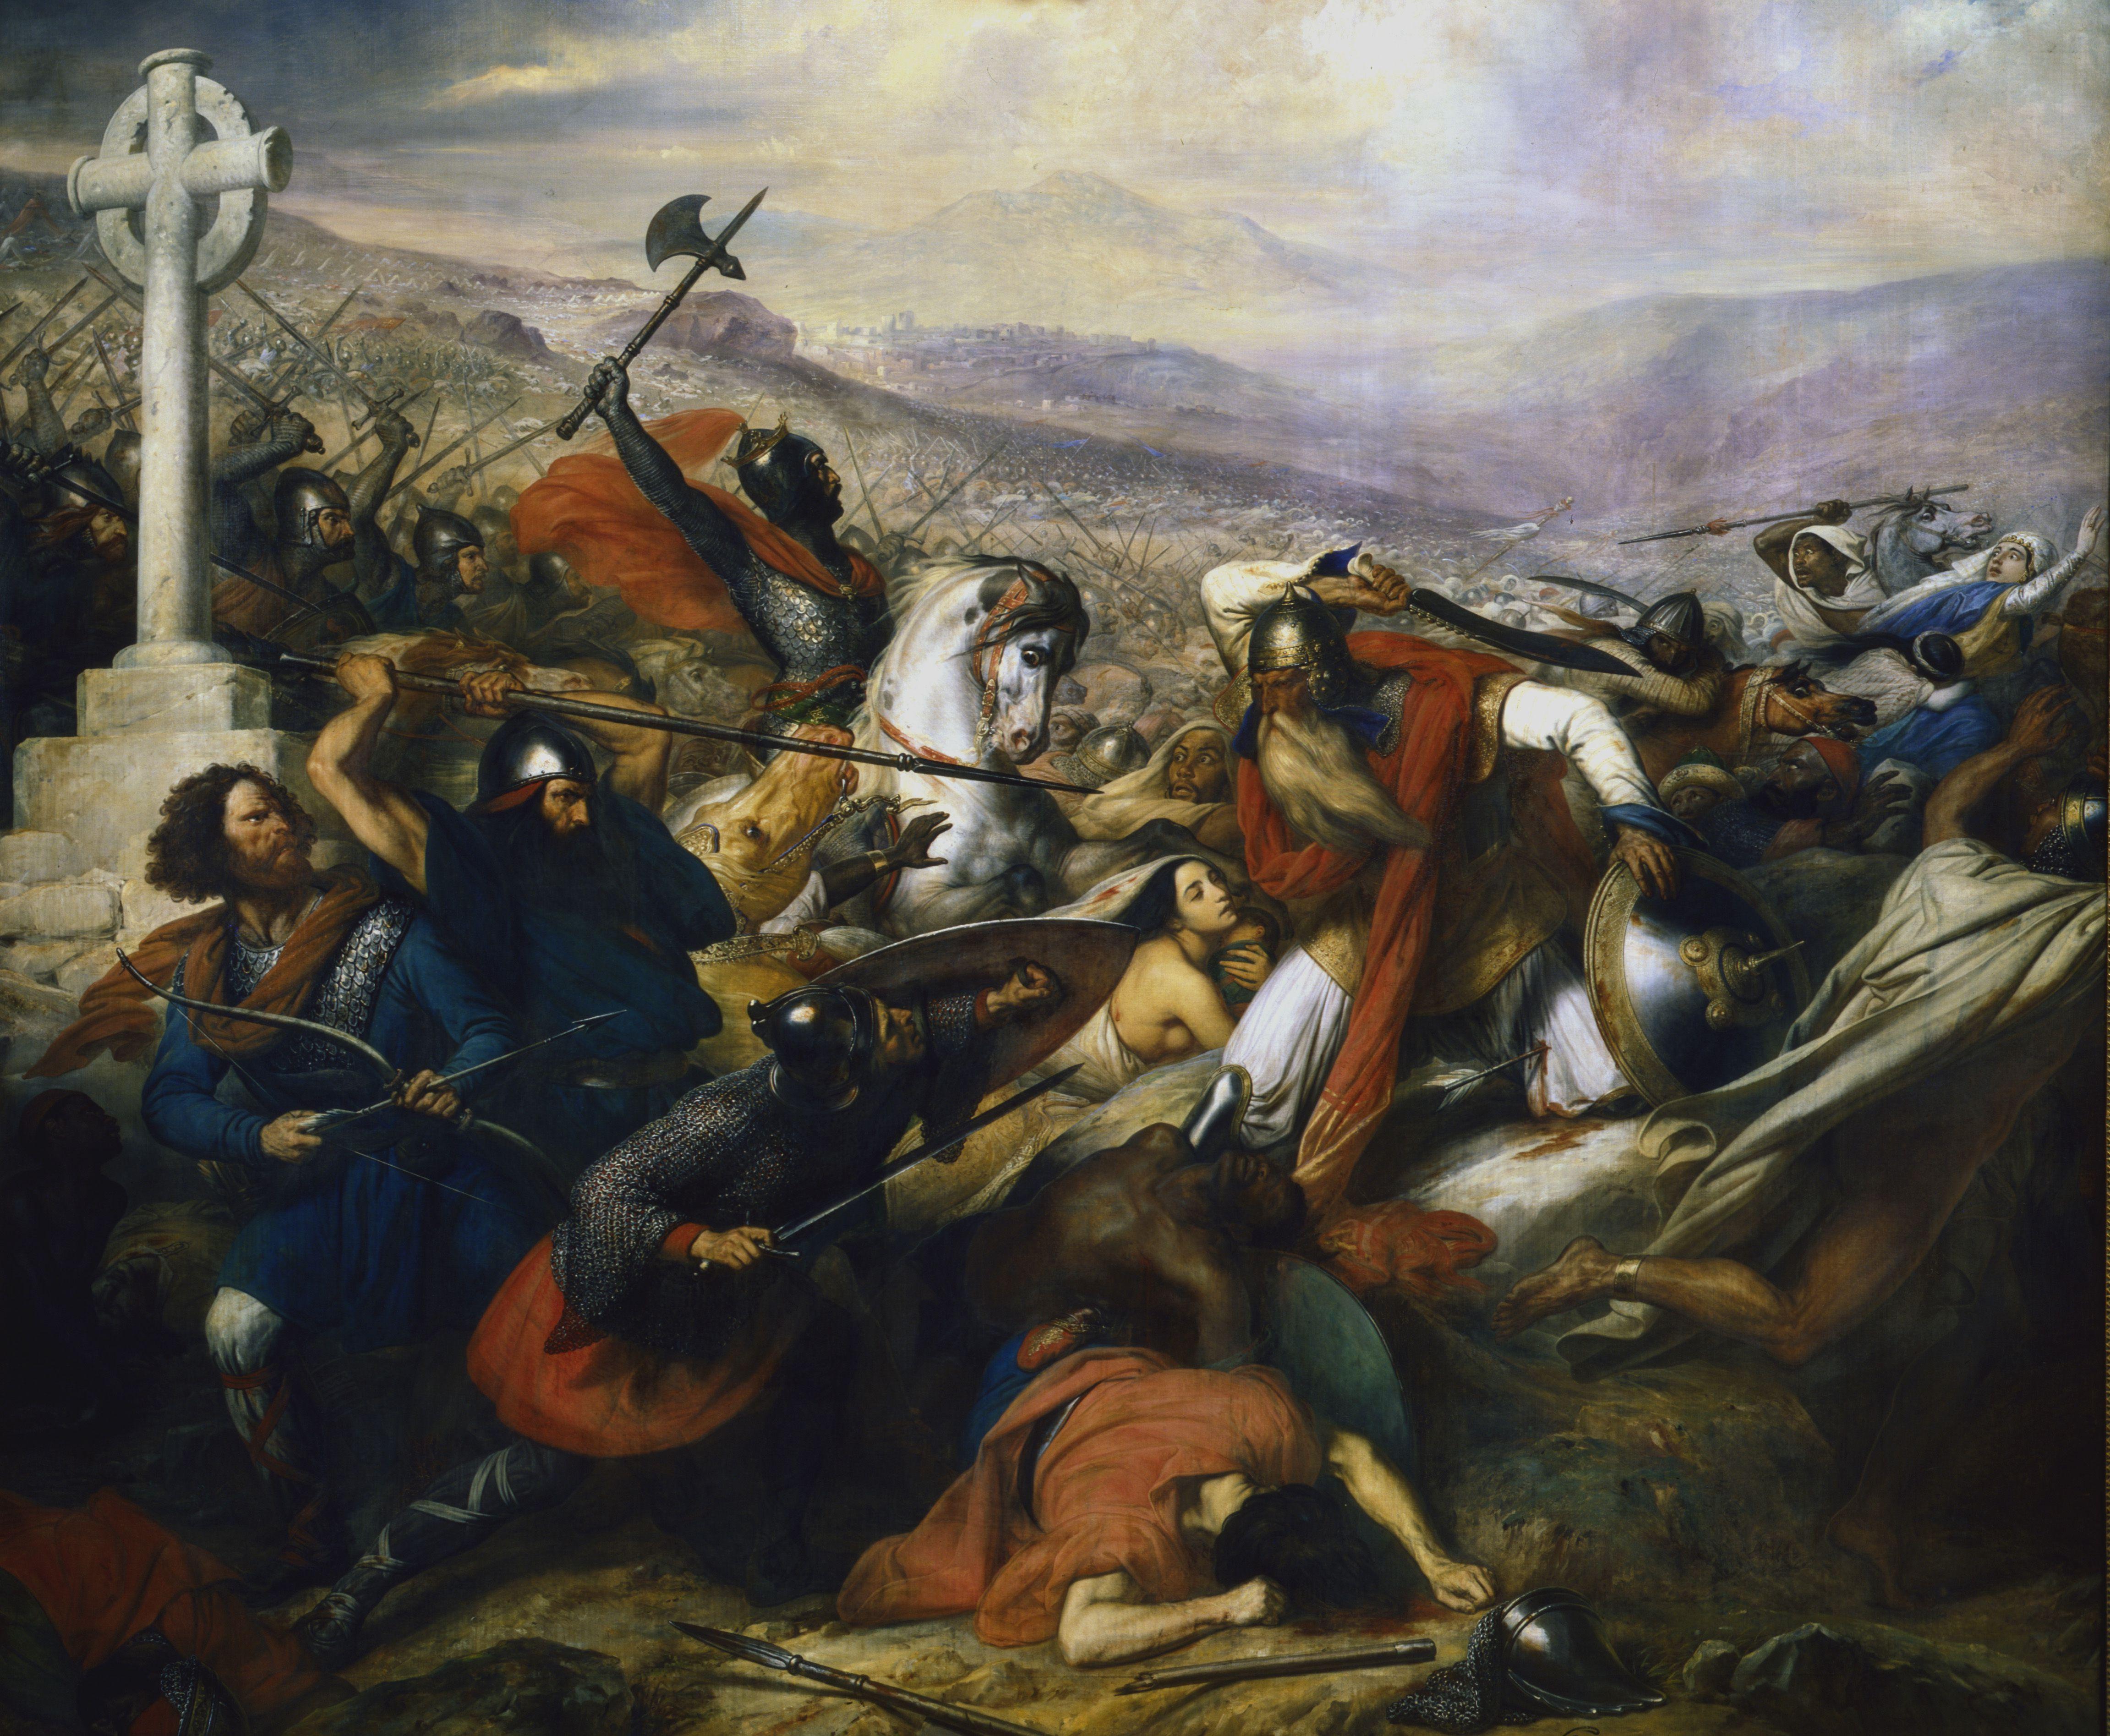 Battle of Poitiers, France, 732 (1837). Artist: Charles Auguste Guillaume Steuben